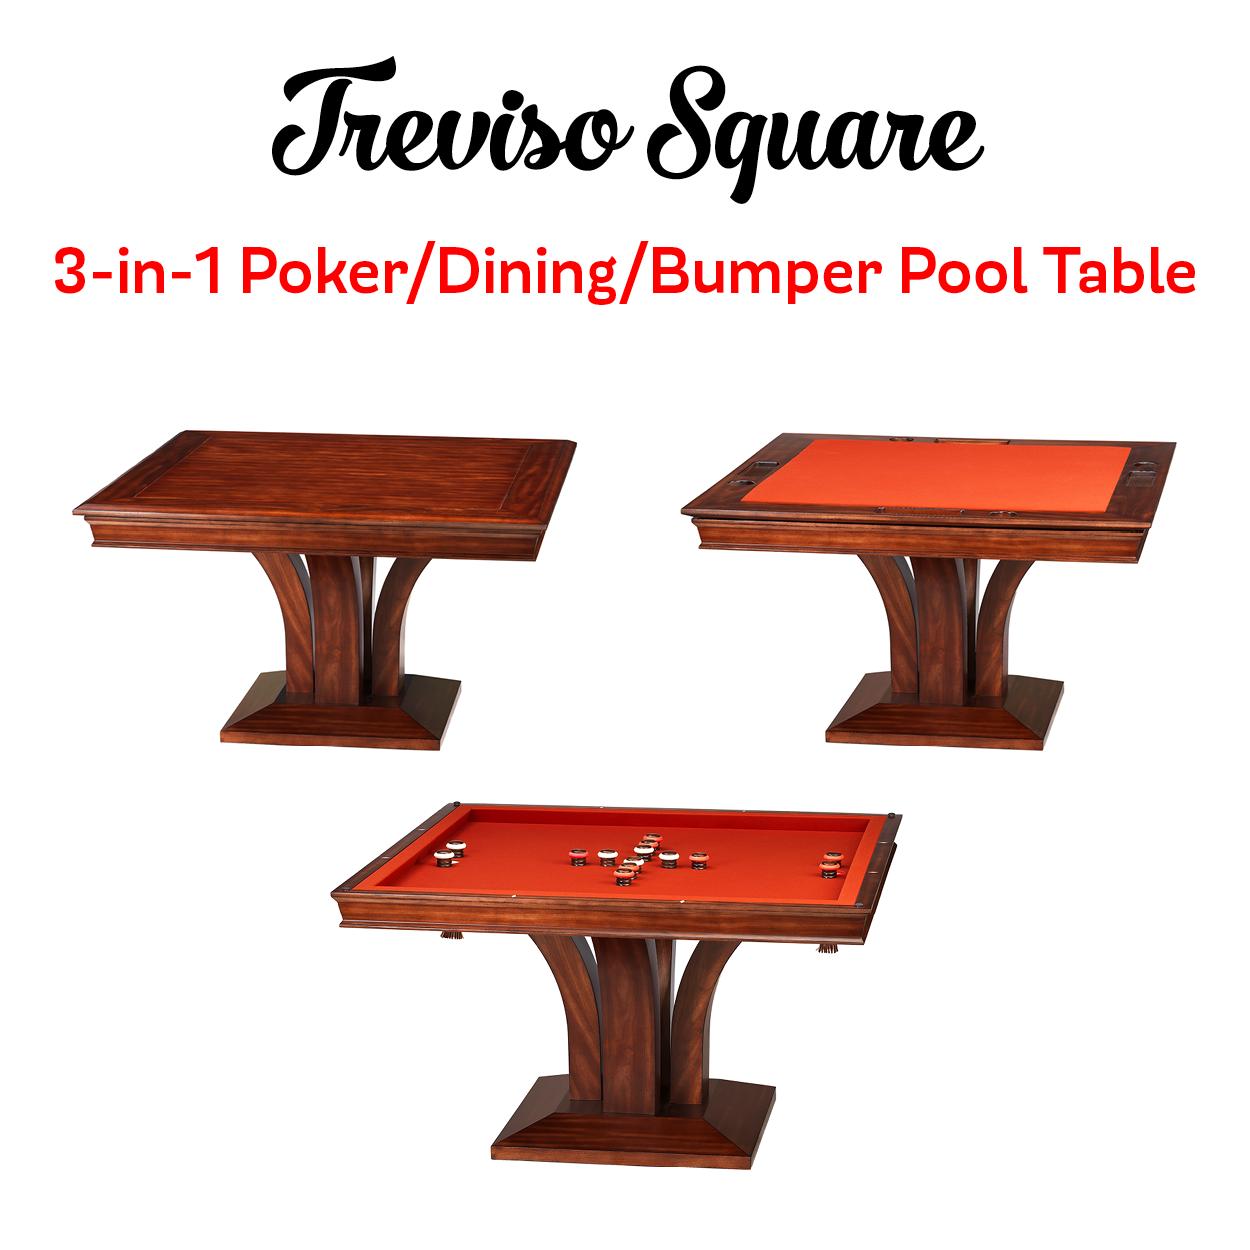 The Darafeev Treviso Square Combination Game Table Comes